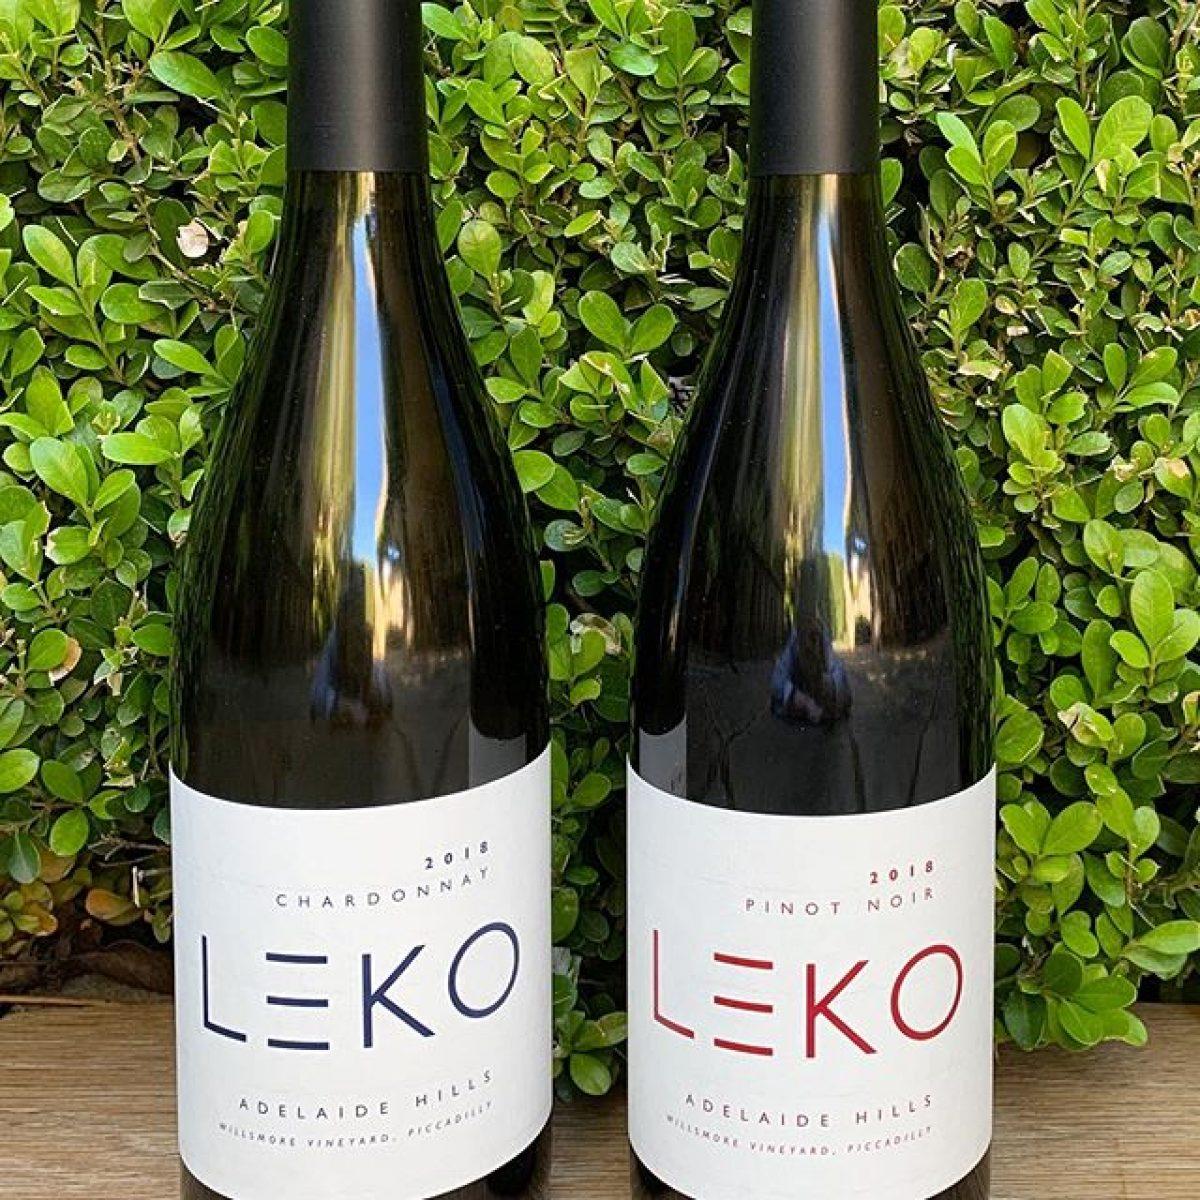 LEKO Adelaide Hills Duo